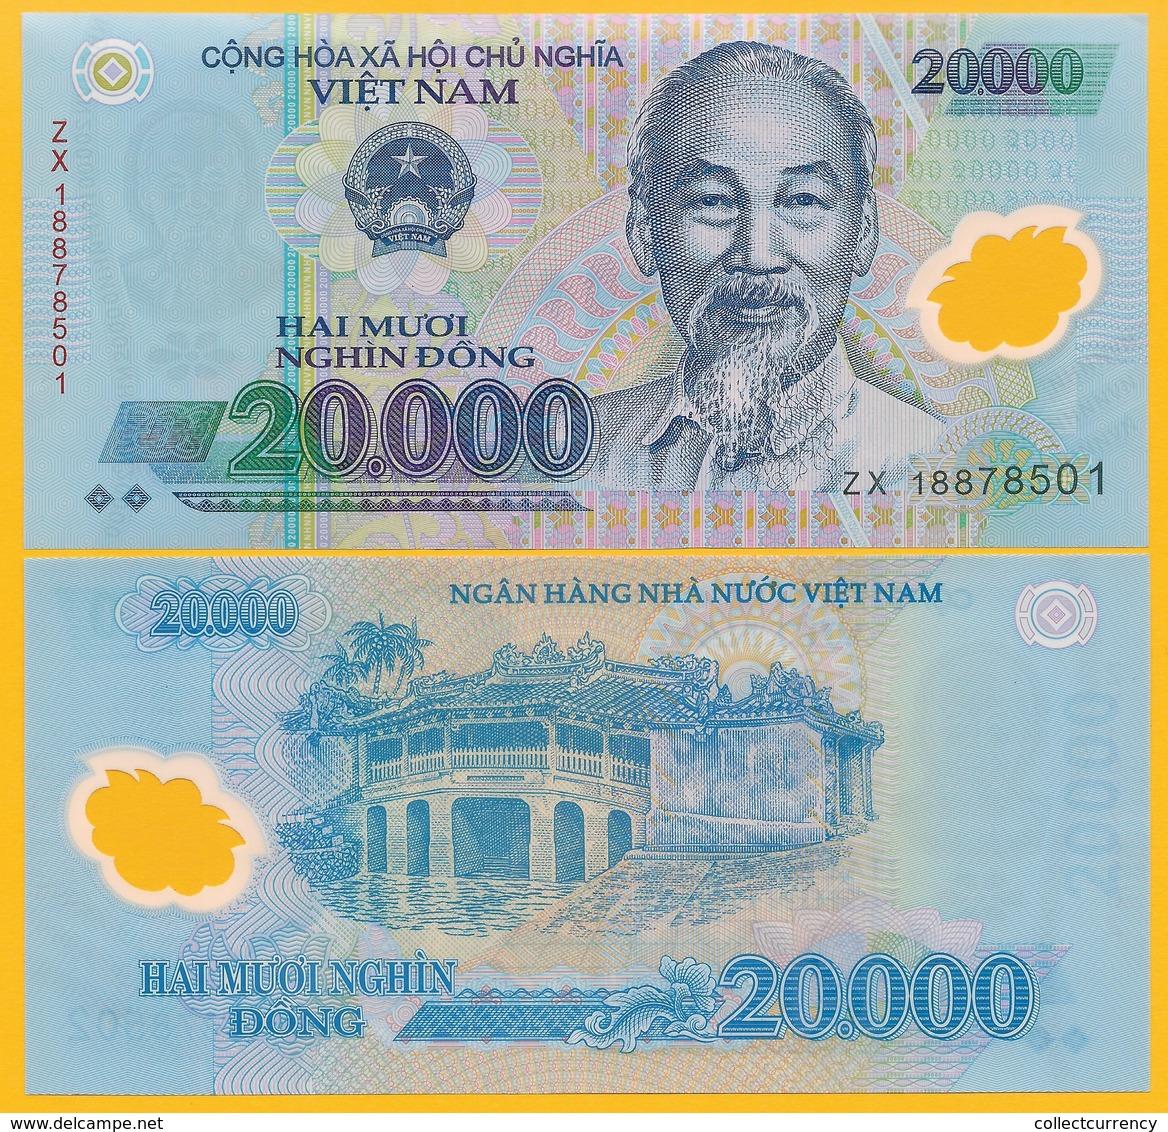 Vietnam Viet Nam 20000 (20,000) Dong P-120 2018 UNC Polymer Banknote - Vietnam